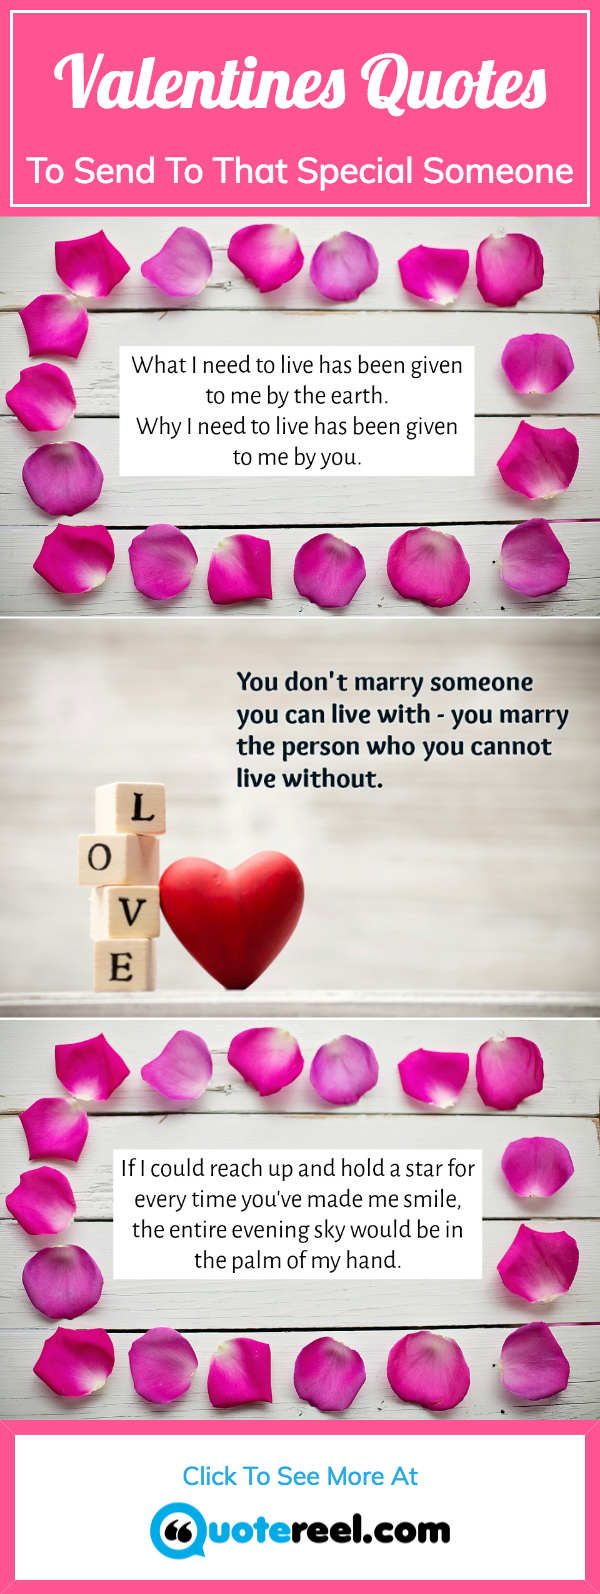 Valentines Quotes Pin